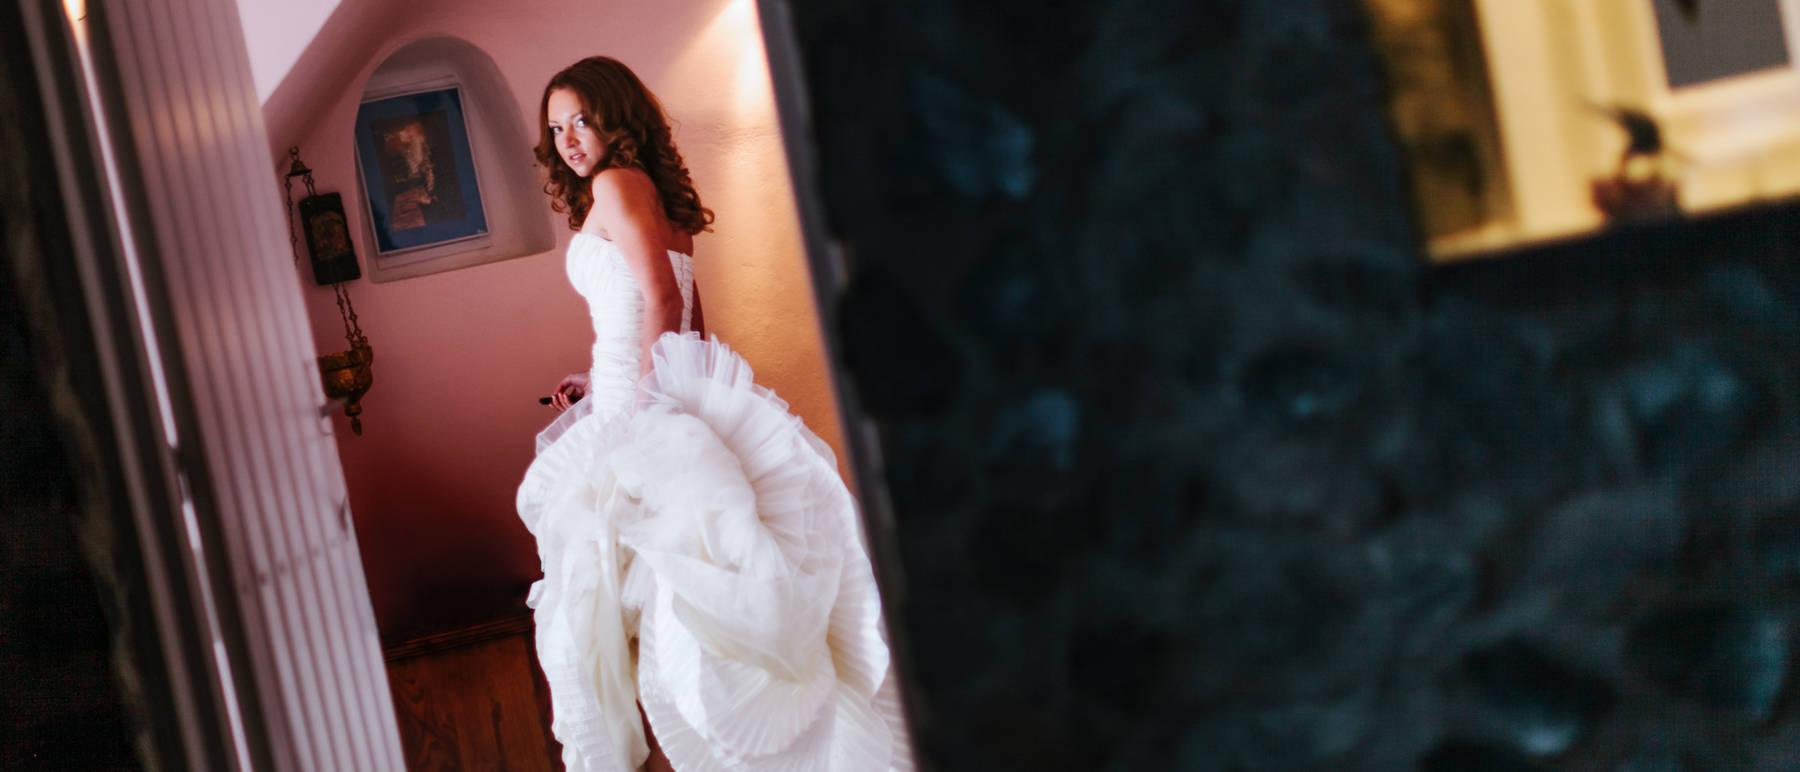 johnandjoseph-wedding-photographer-hz-slider-161